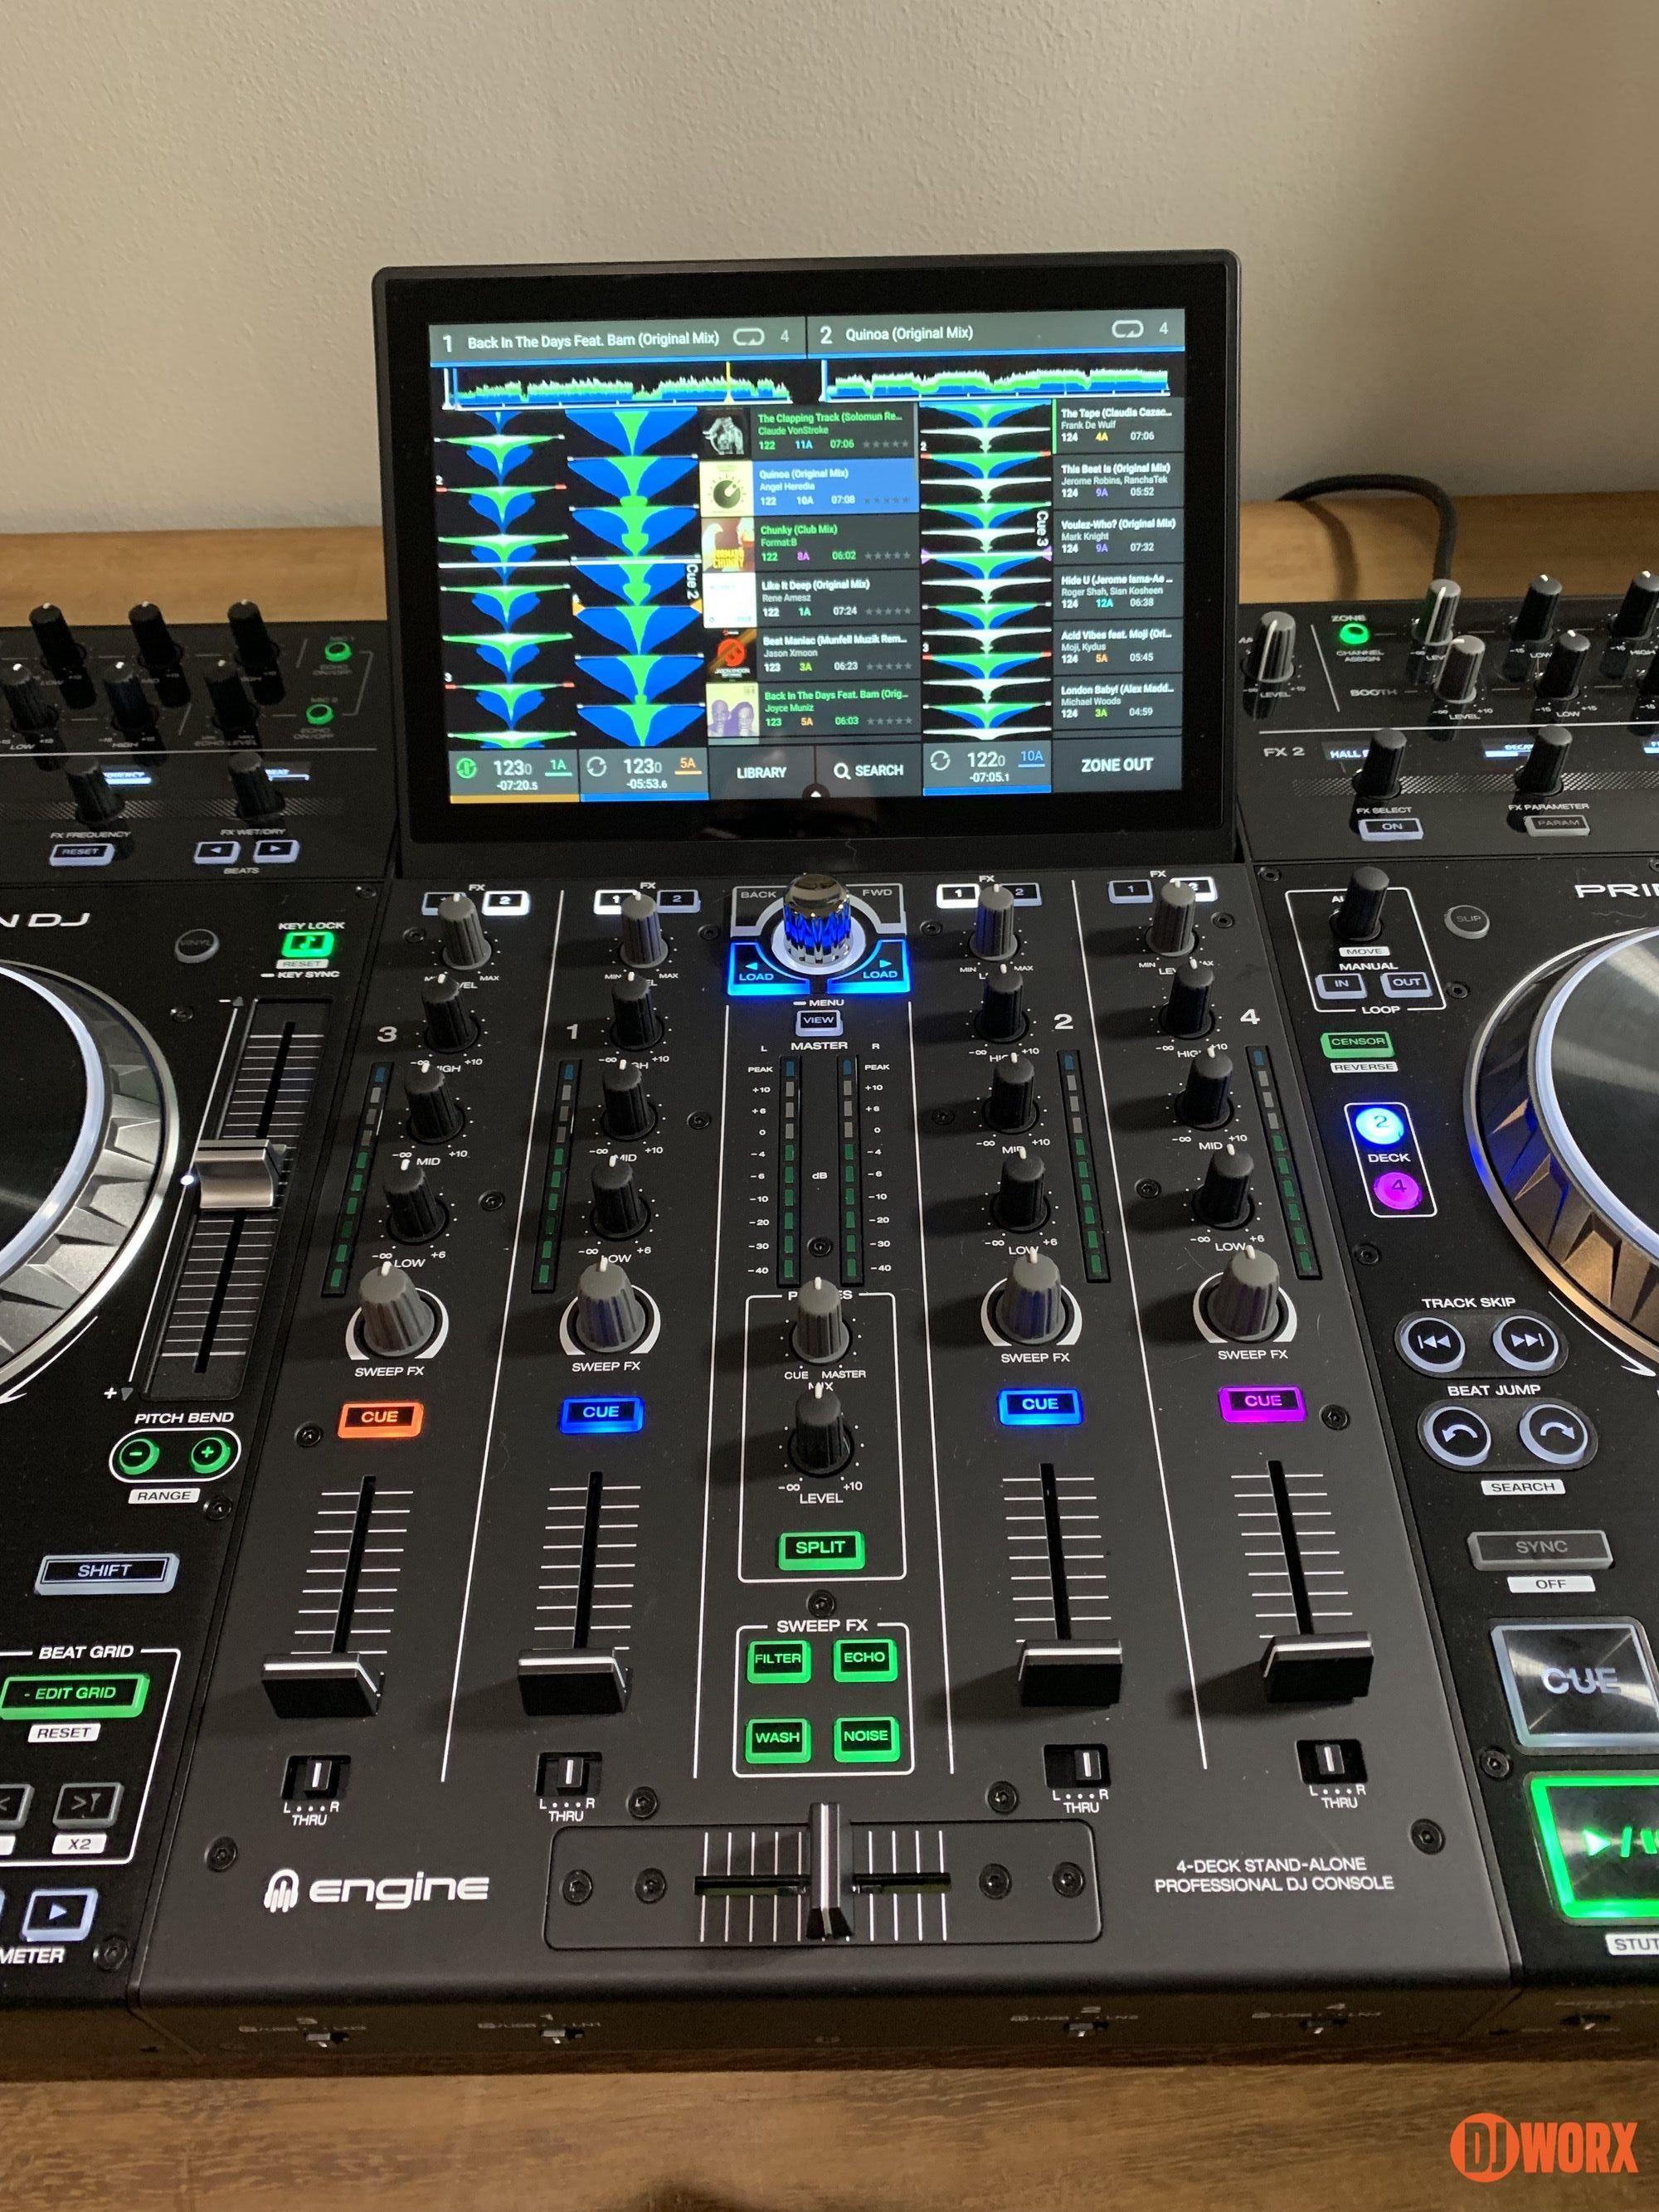 Denon DJ Prime 4 standalone system controller DJWORX (5)